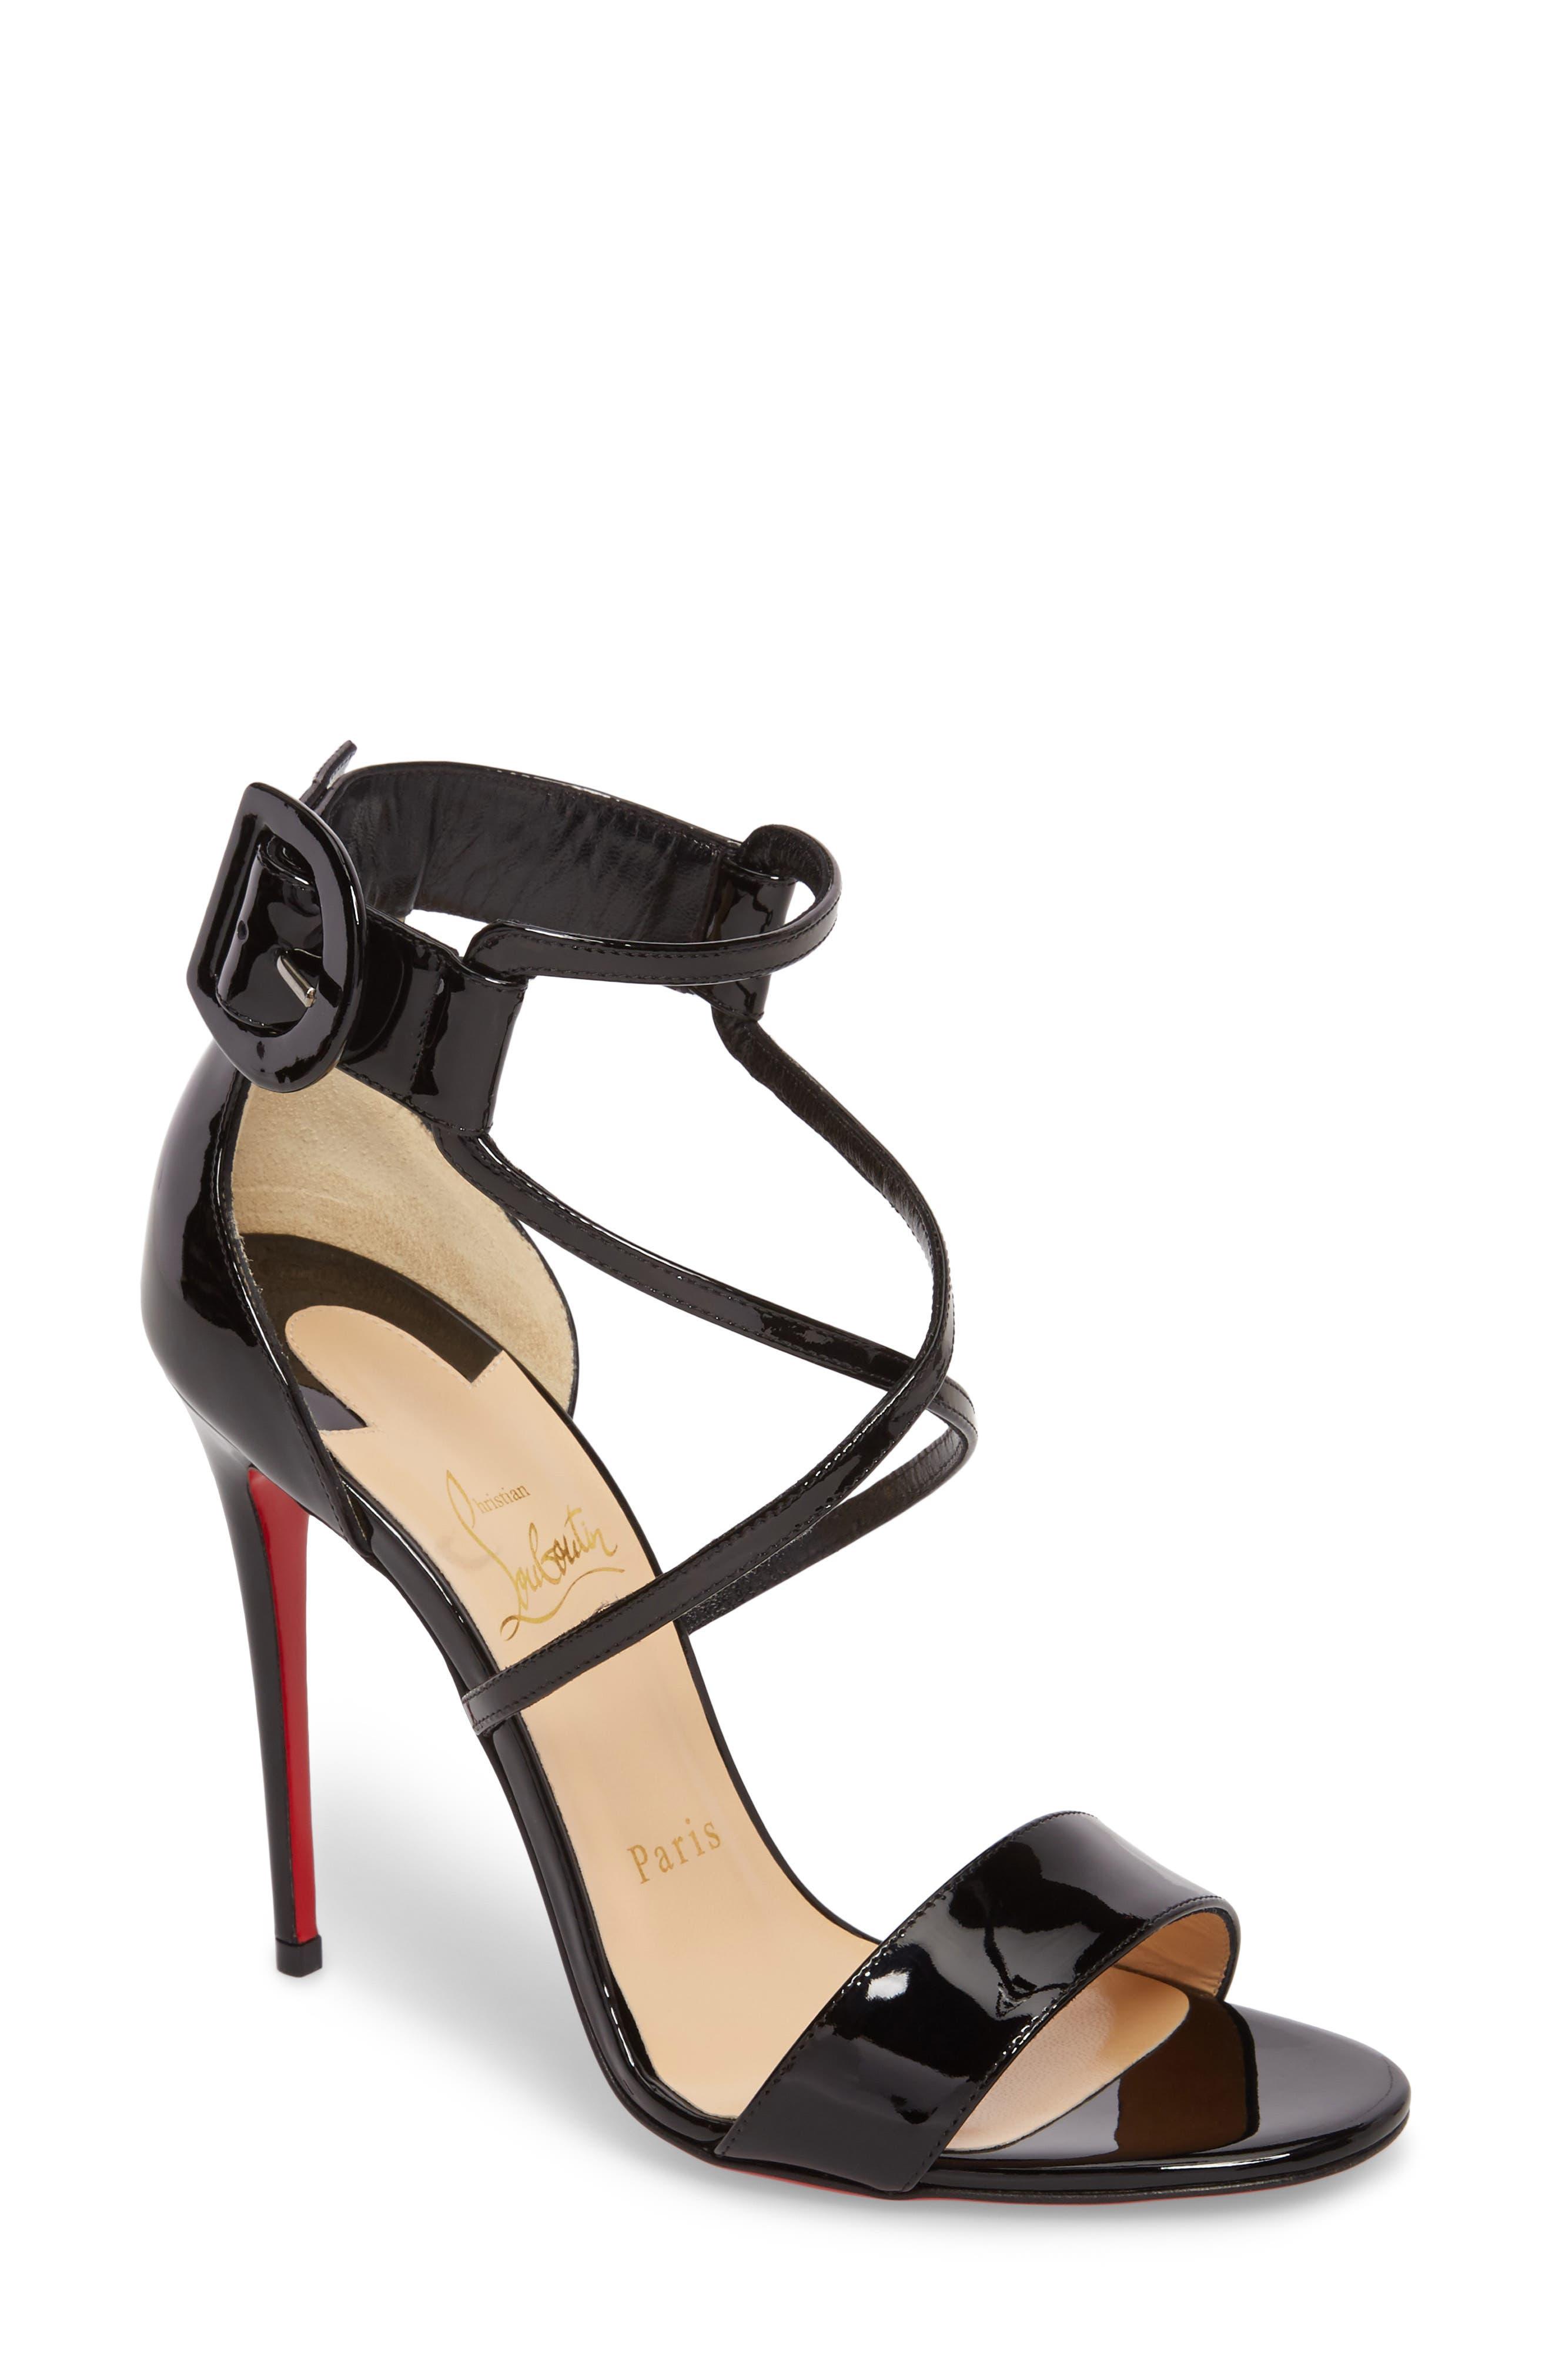 CHRISTIAN LOUBOUTIN Choca Criss Sandal, Main, color, BLACK PATENT